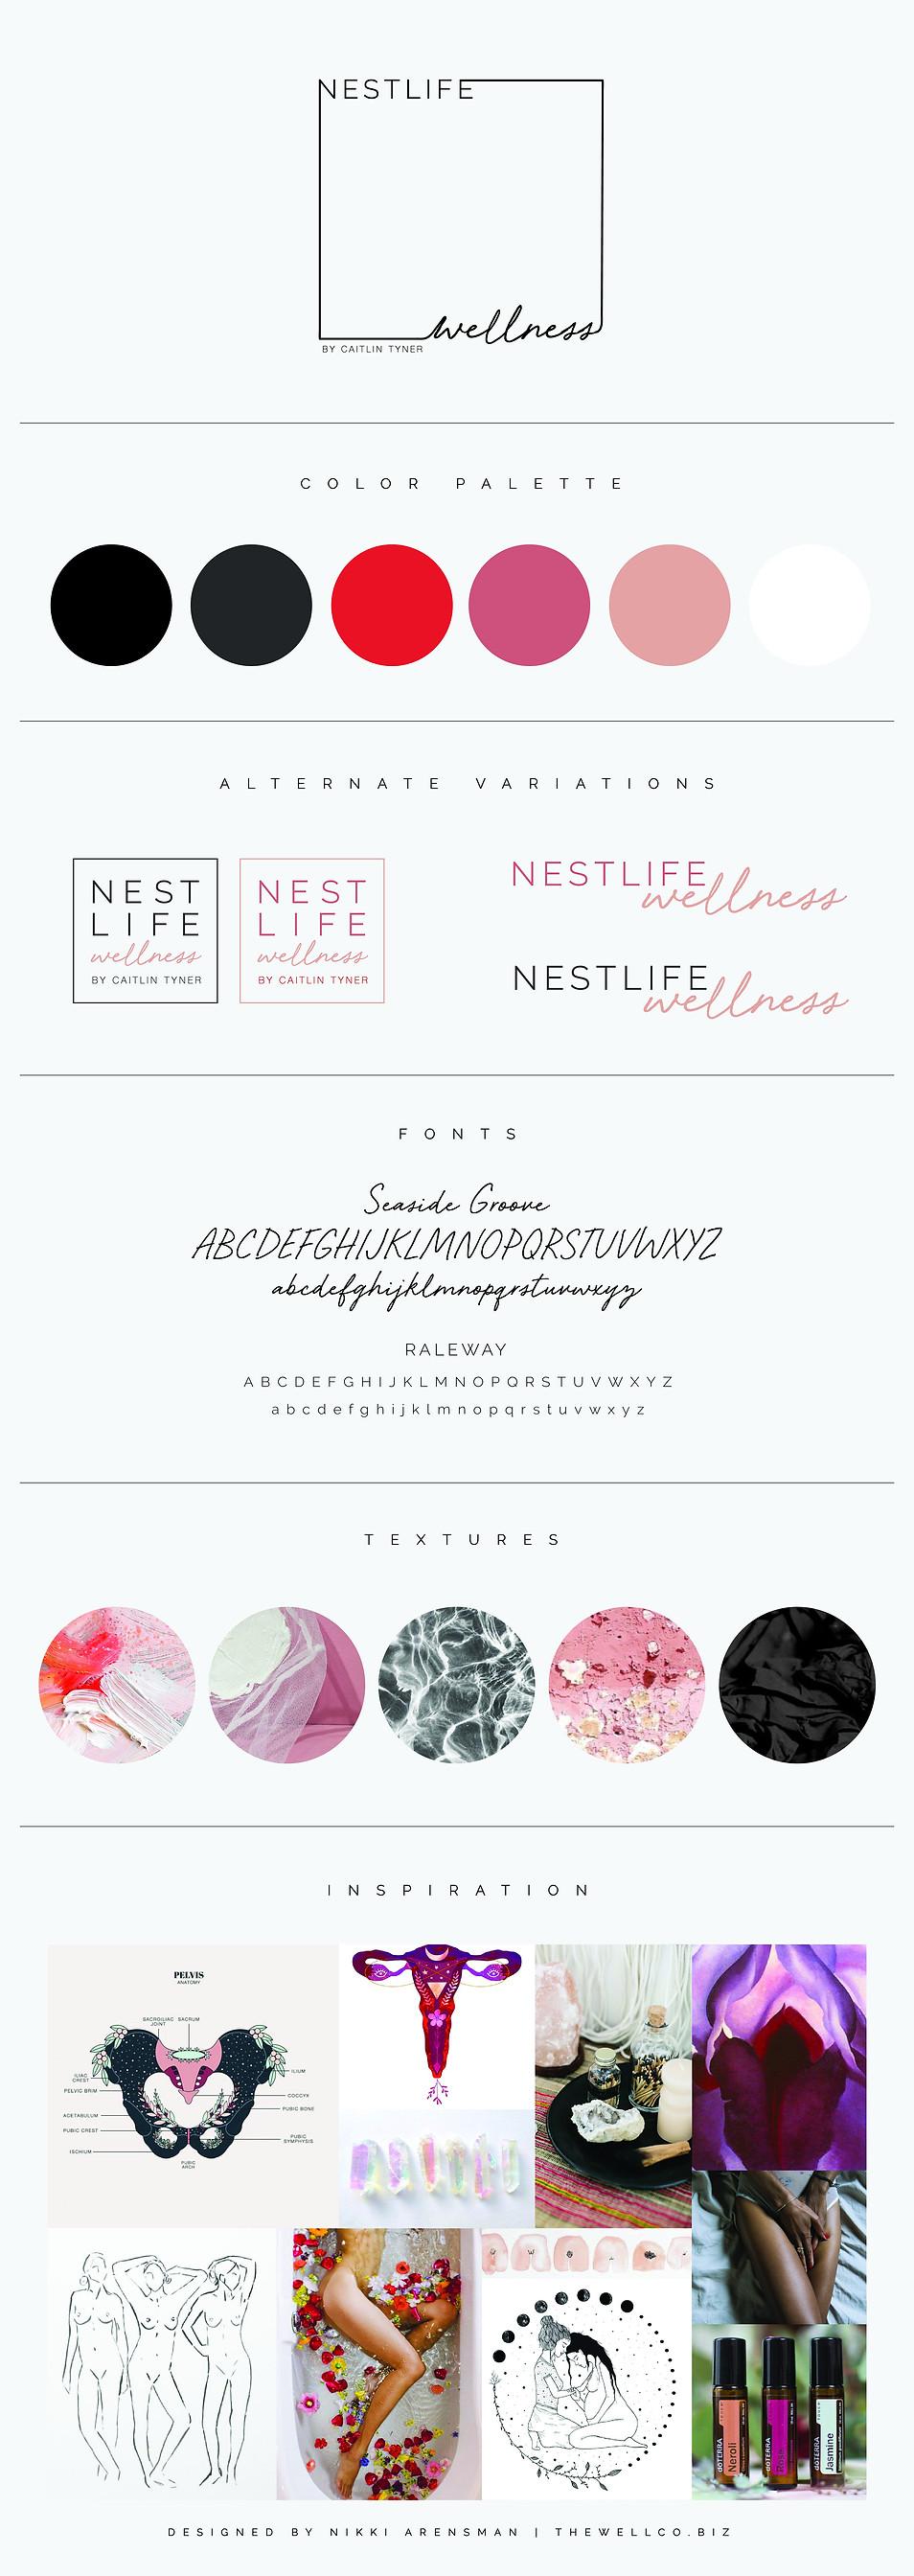 Nestlife+BrandBoard-01.jpg